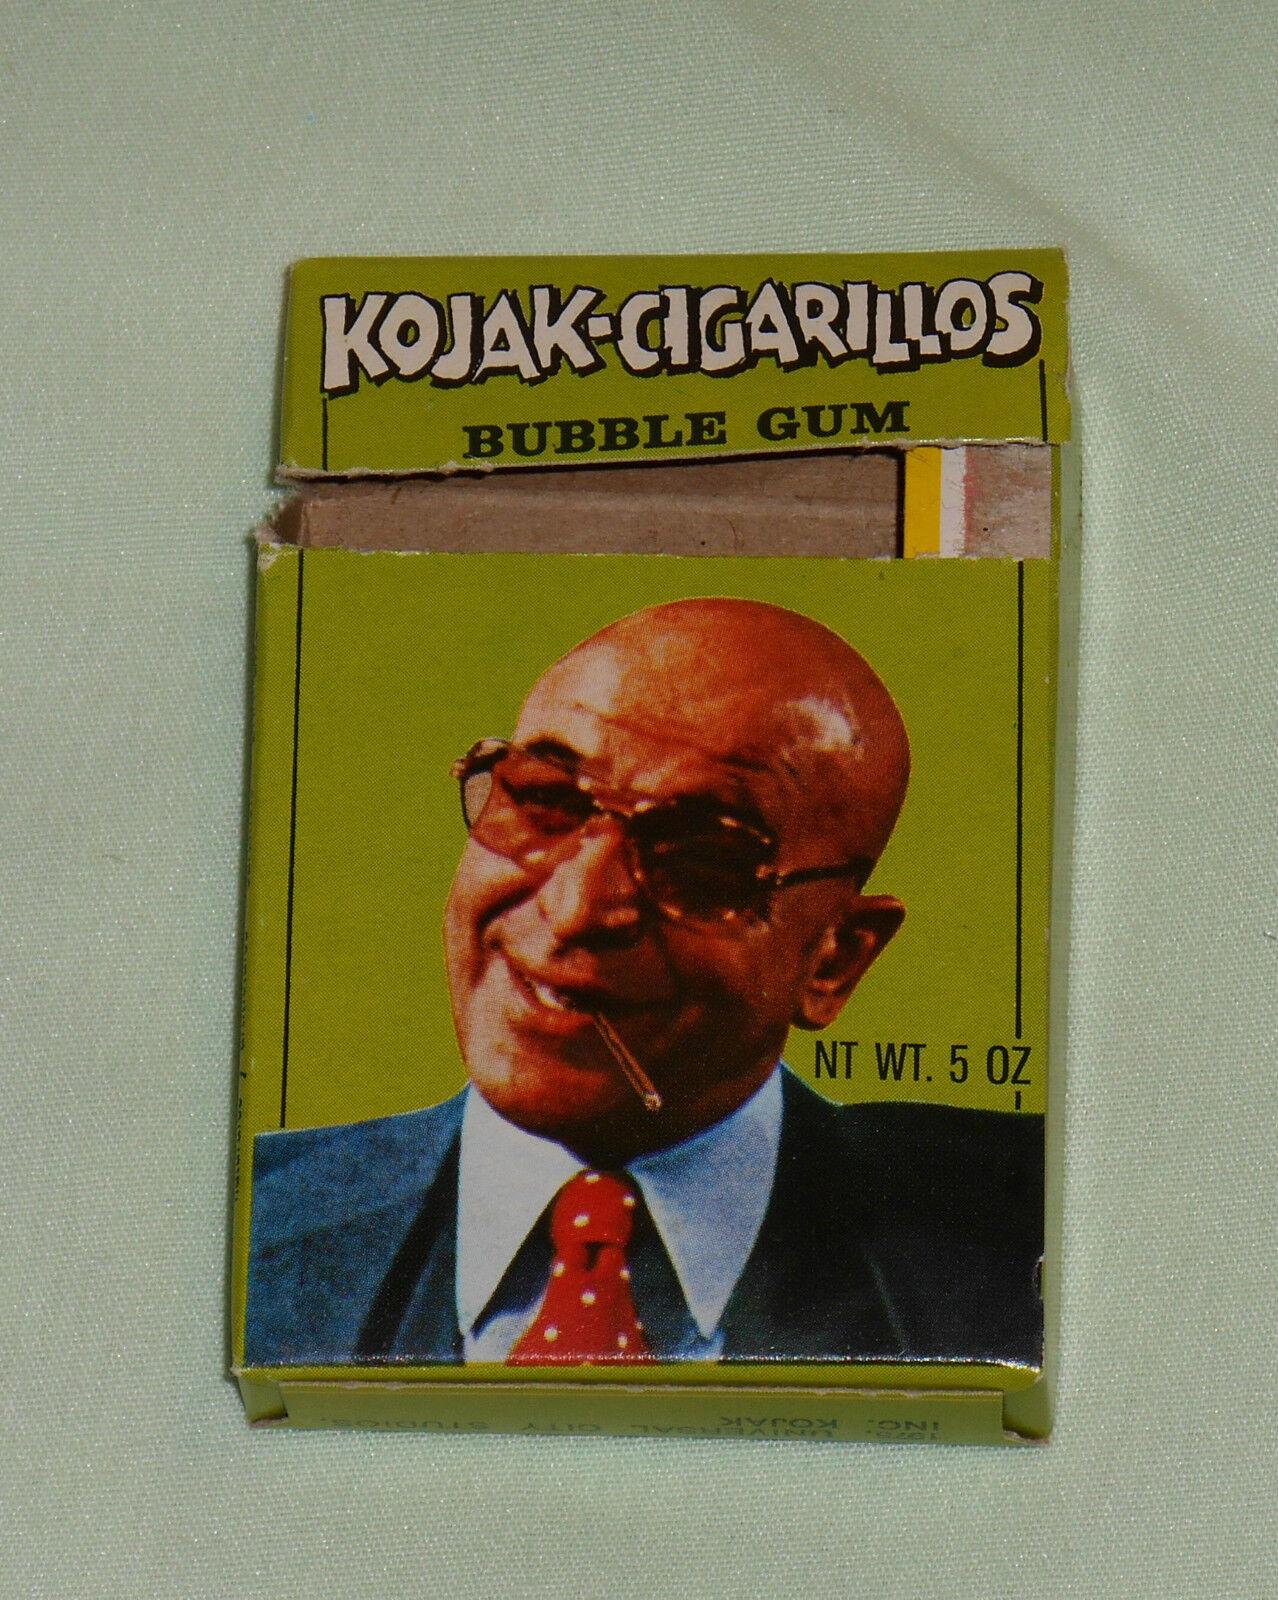 Vintage KOJAK CIGARILLOS BUBBLE GUM empty box by Candygum